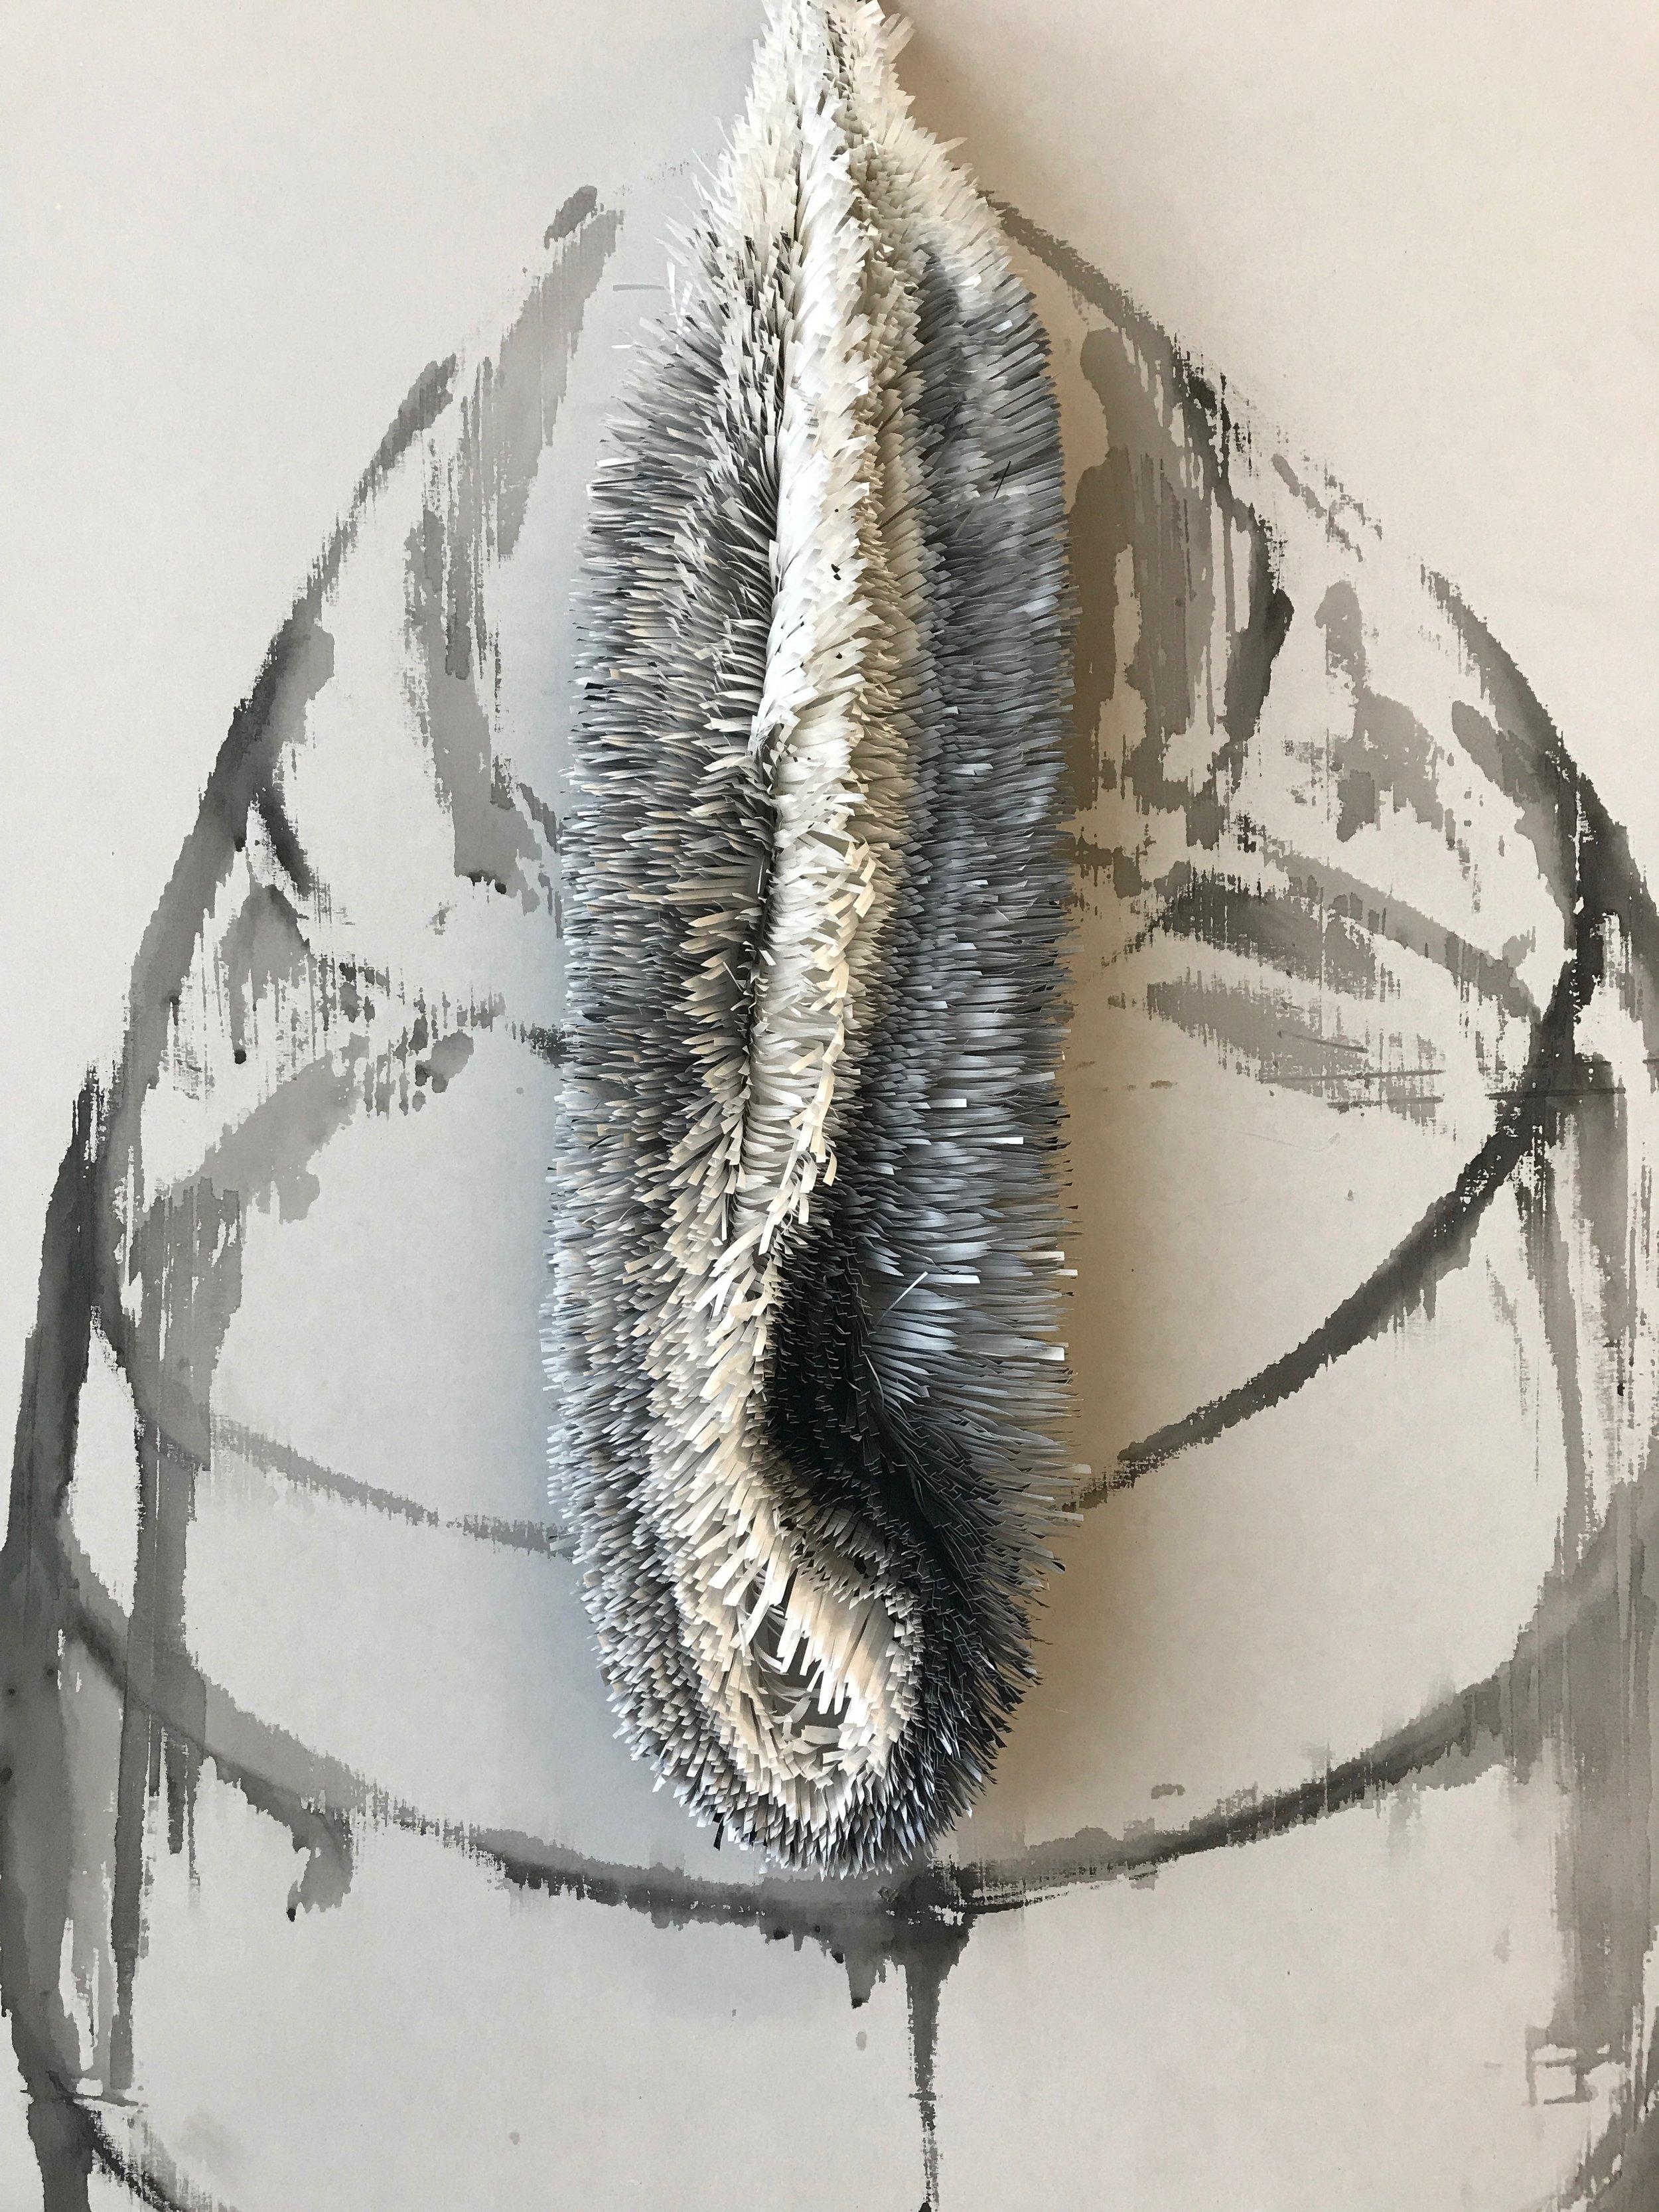 Scherenschnitte I, 2018, ink on paper (on plasterboard)